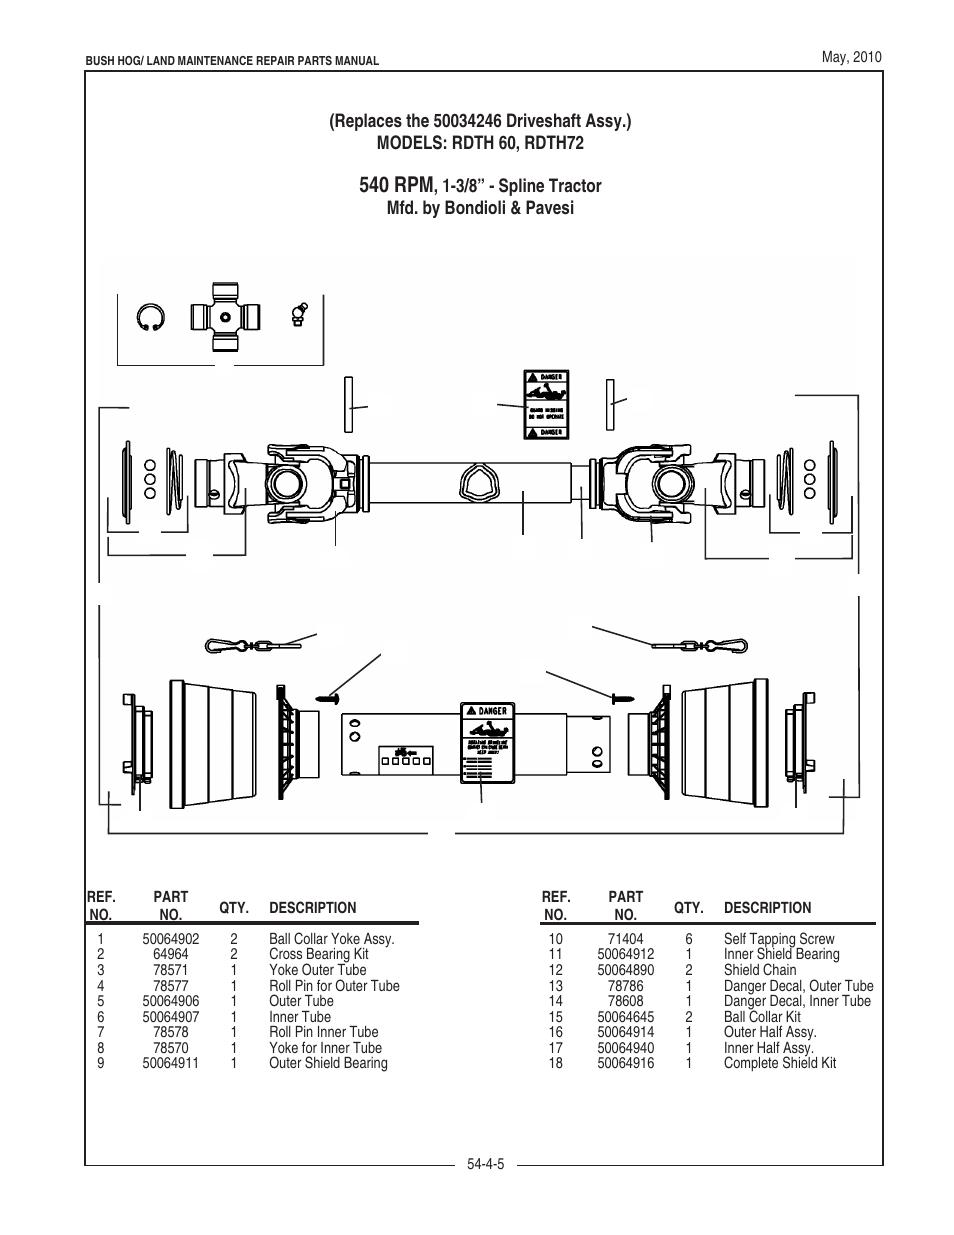 medium resolution of 540 rpm bush hog rdth series rdth 72 user manual page 19 28